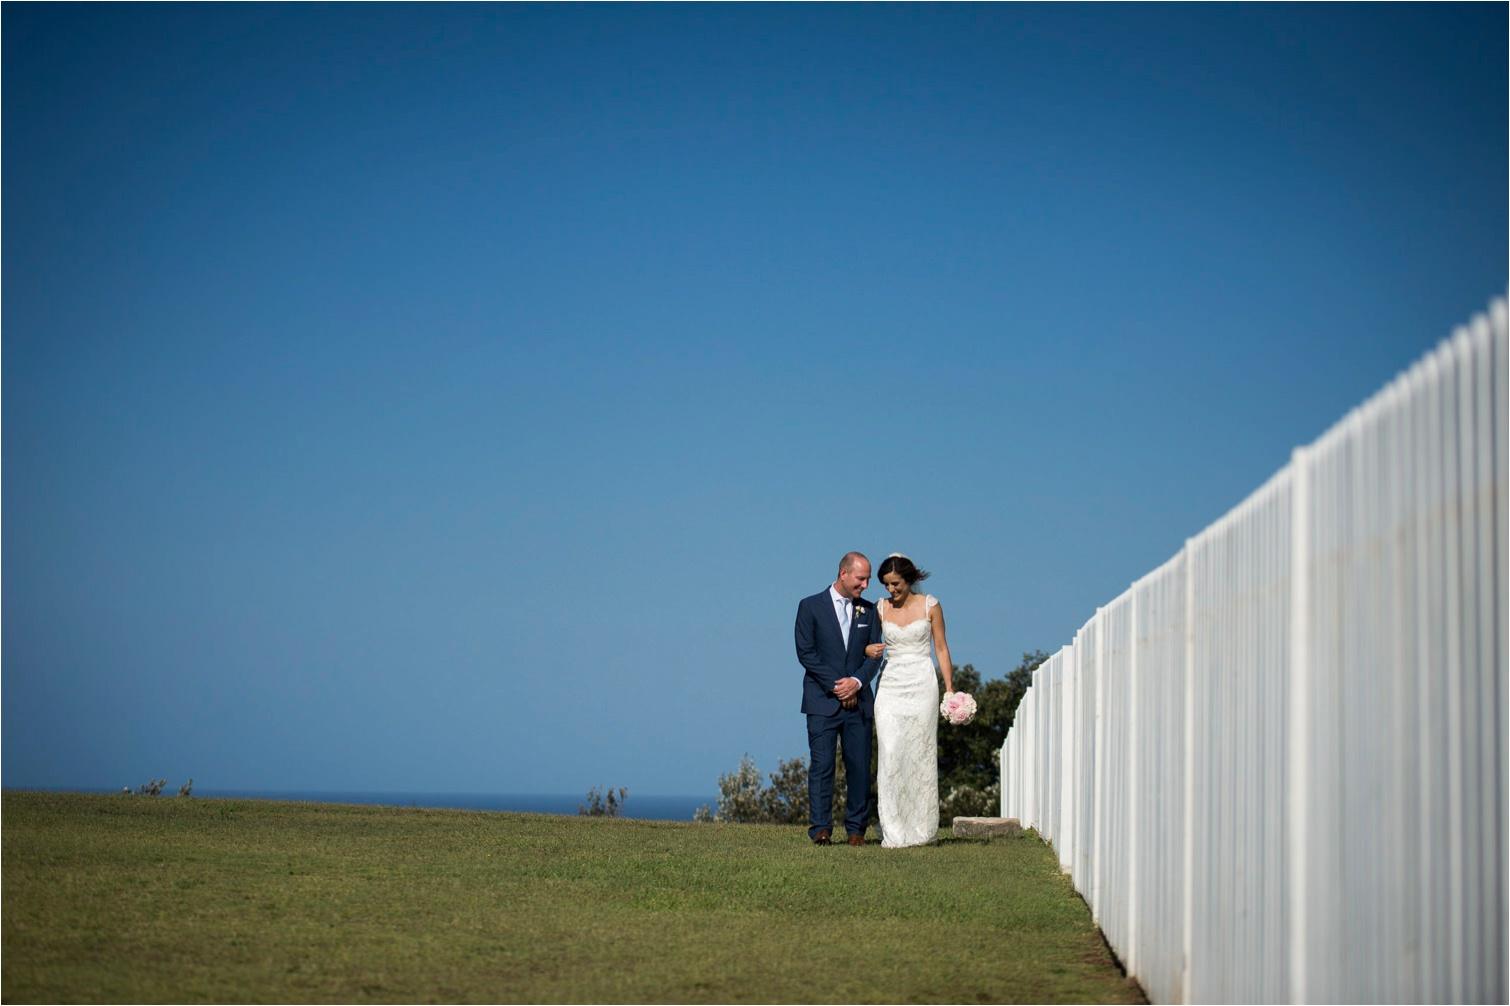 Nicole&Carlie_Watsons_Bay_Hotel_Wedding_by_Gold_Coast_Photographers-The_Follans27.jpg